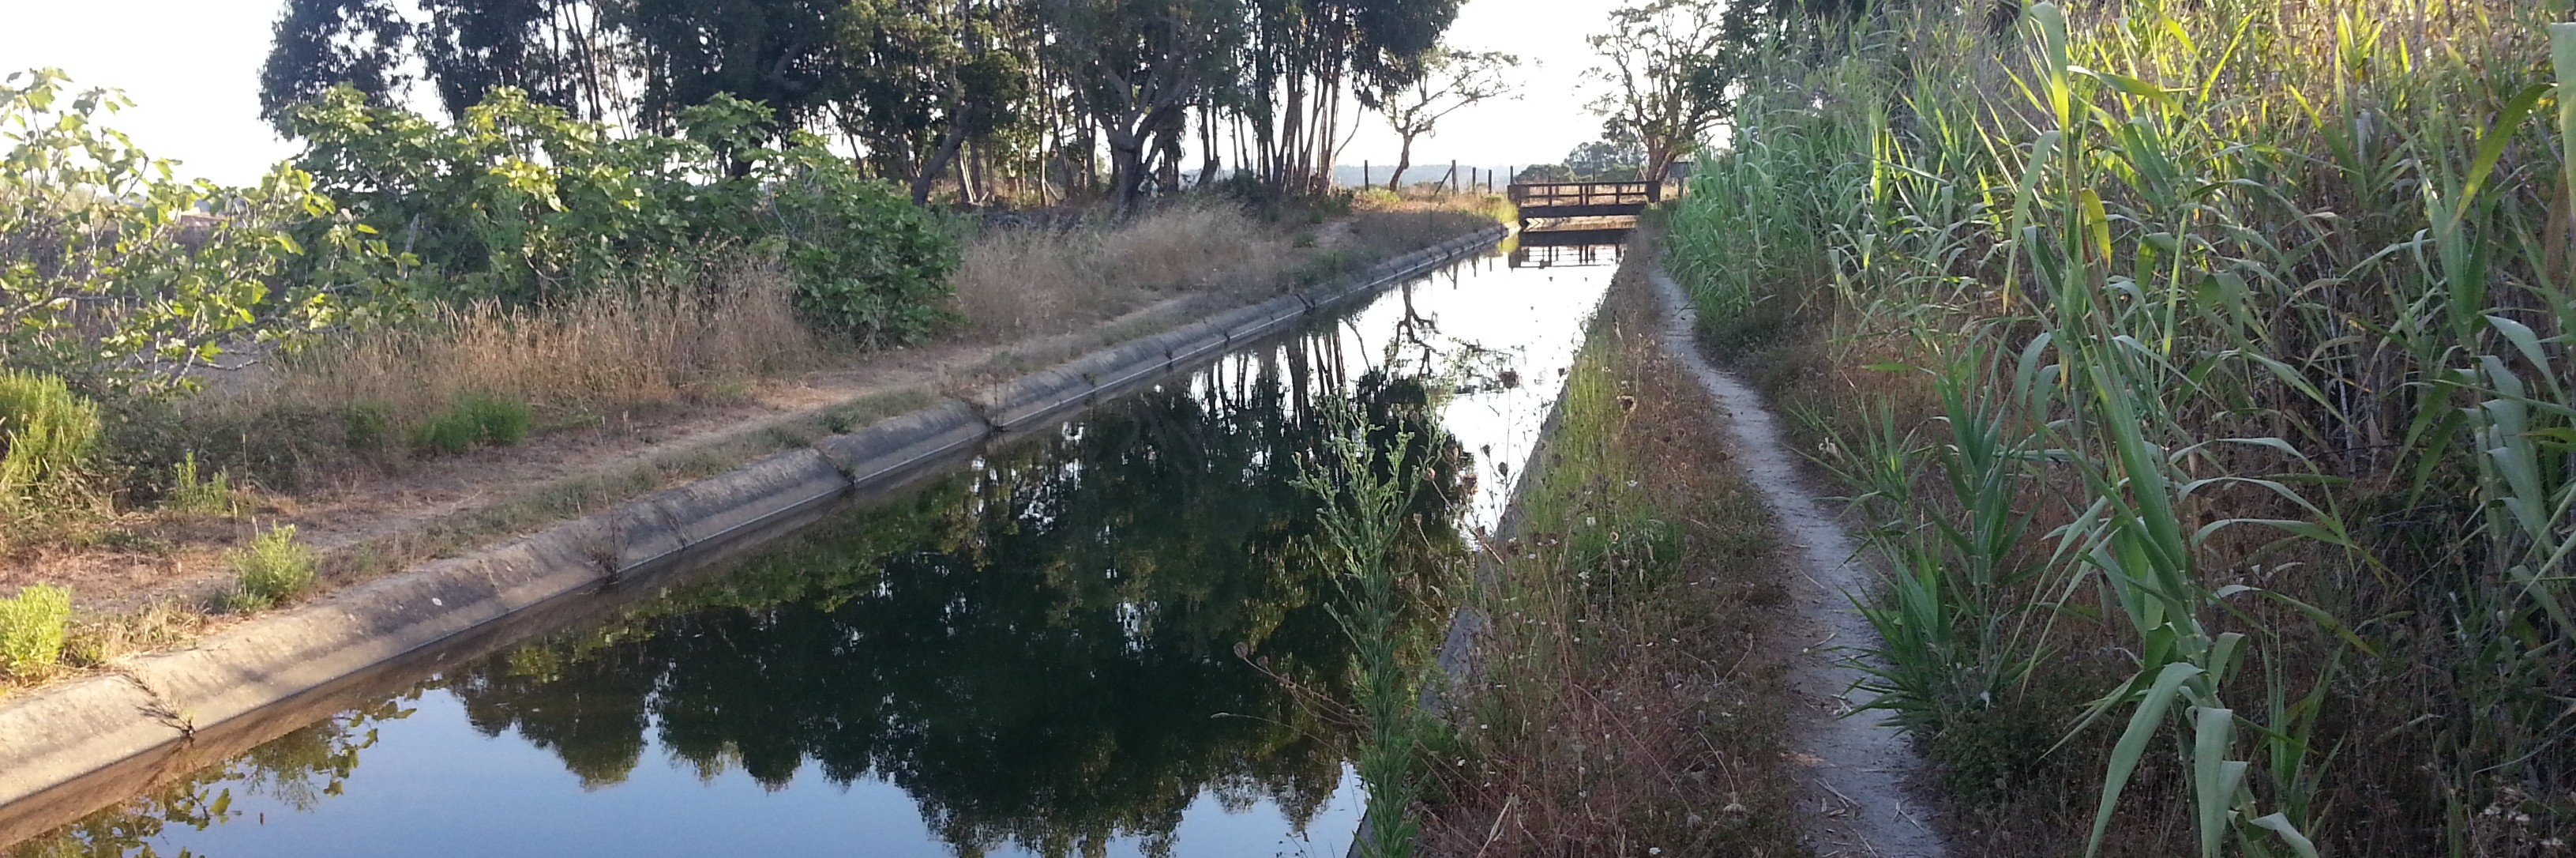 Bivouac au bord du canal à Odeceixe